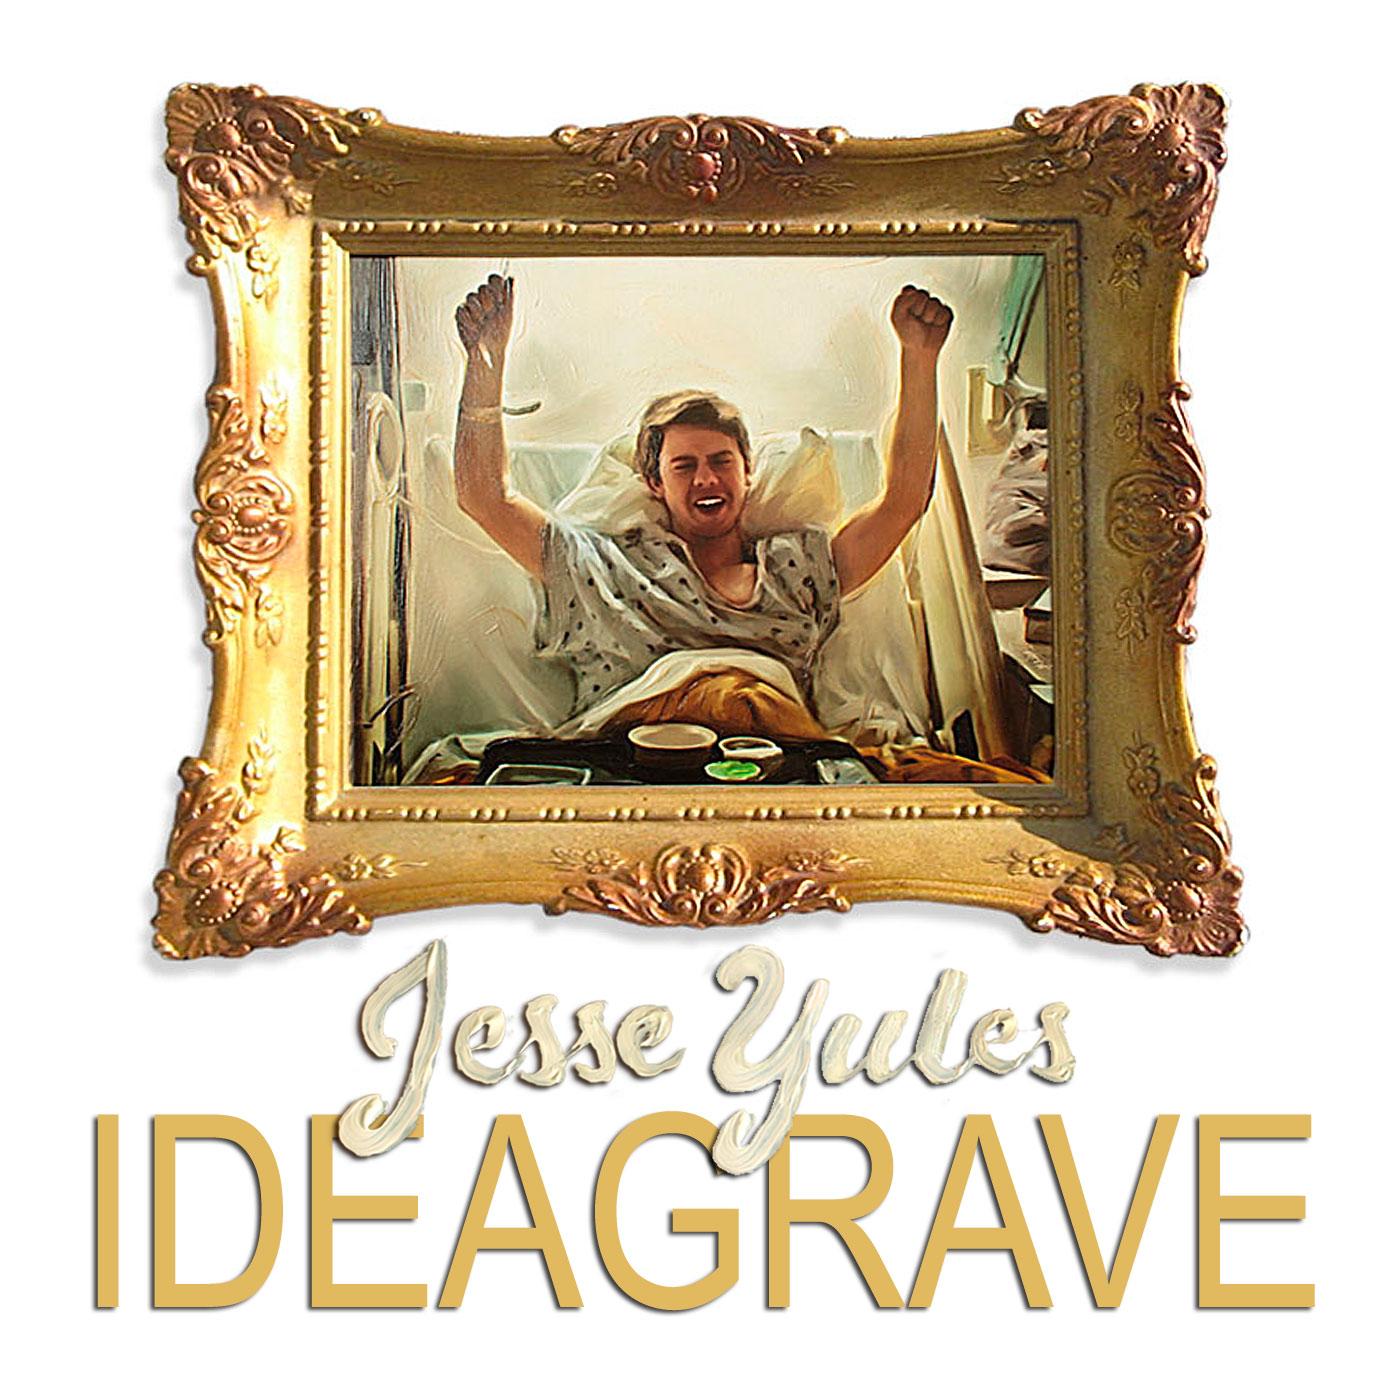 Jesse Yules IdeaGrave